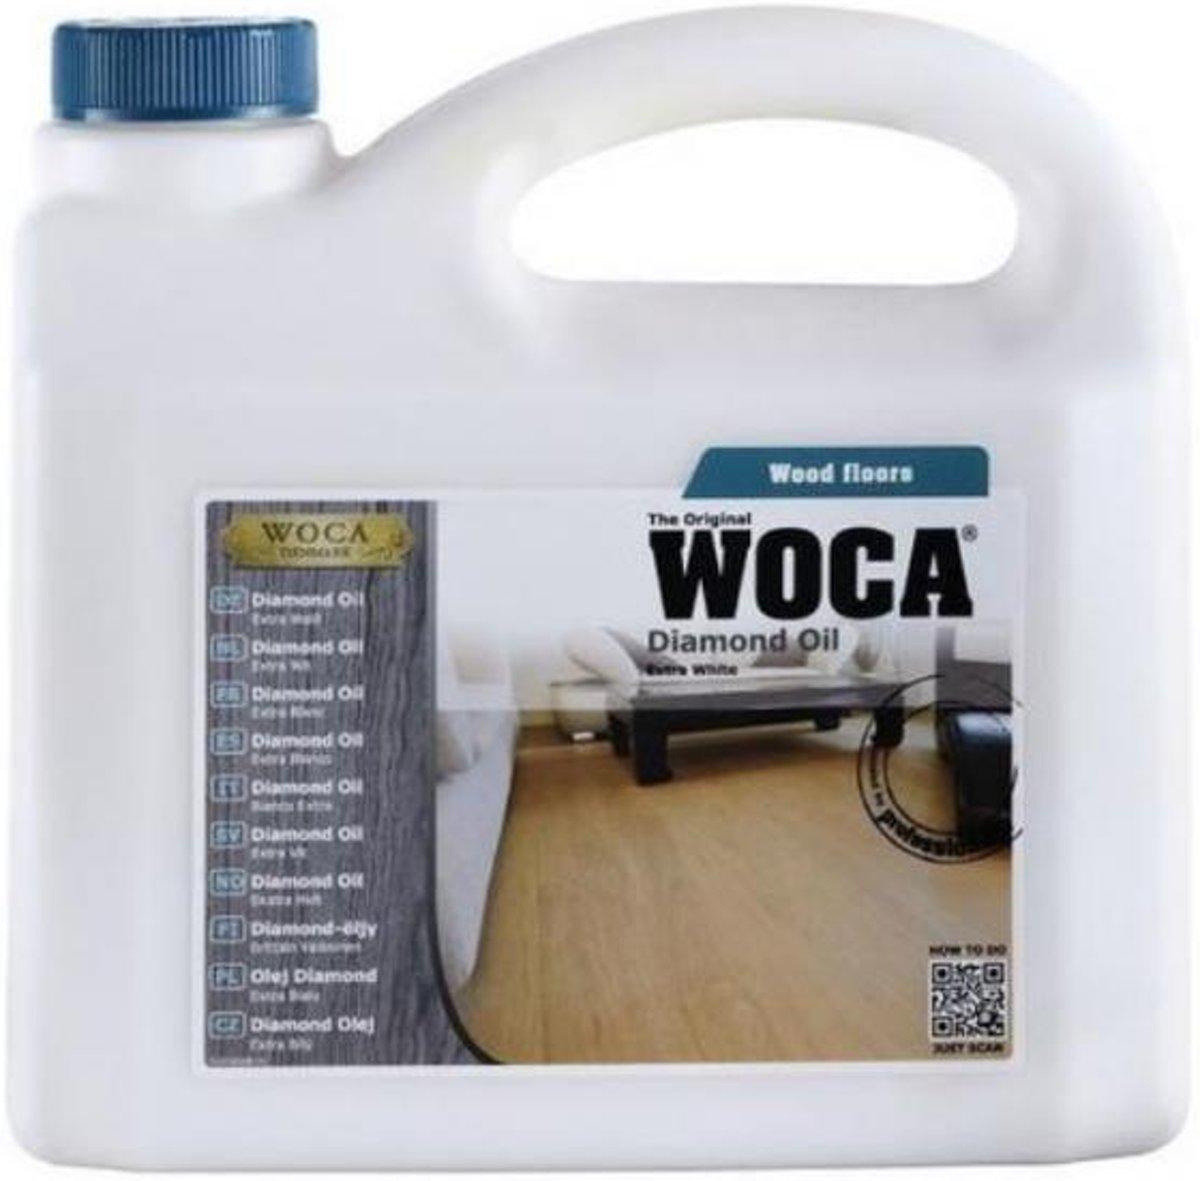 Woca Diamond Olie Extra Wit 13% - 1 liter kopen